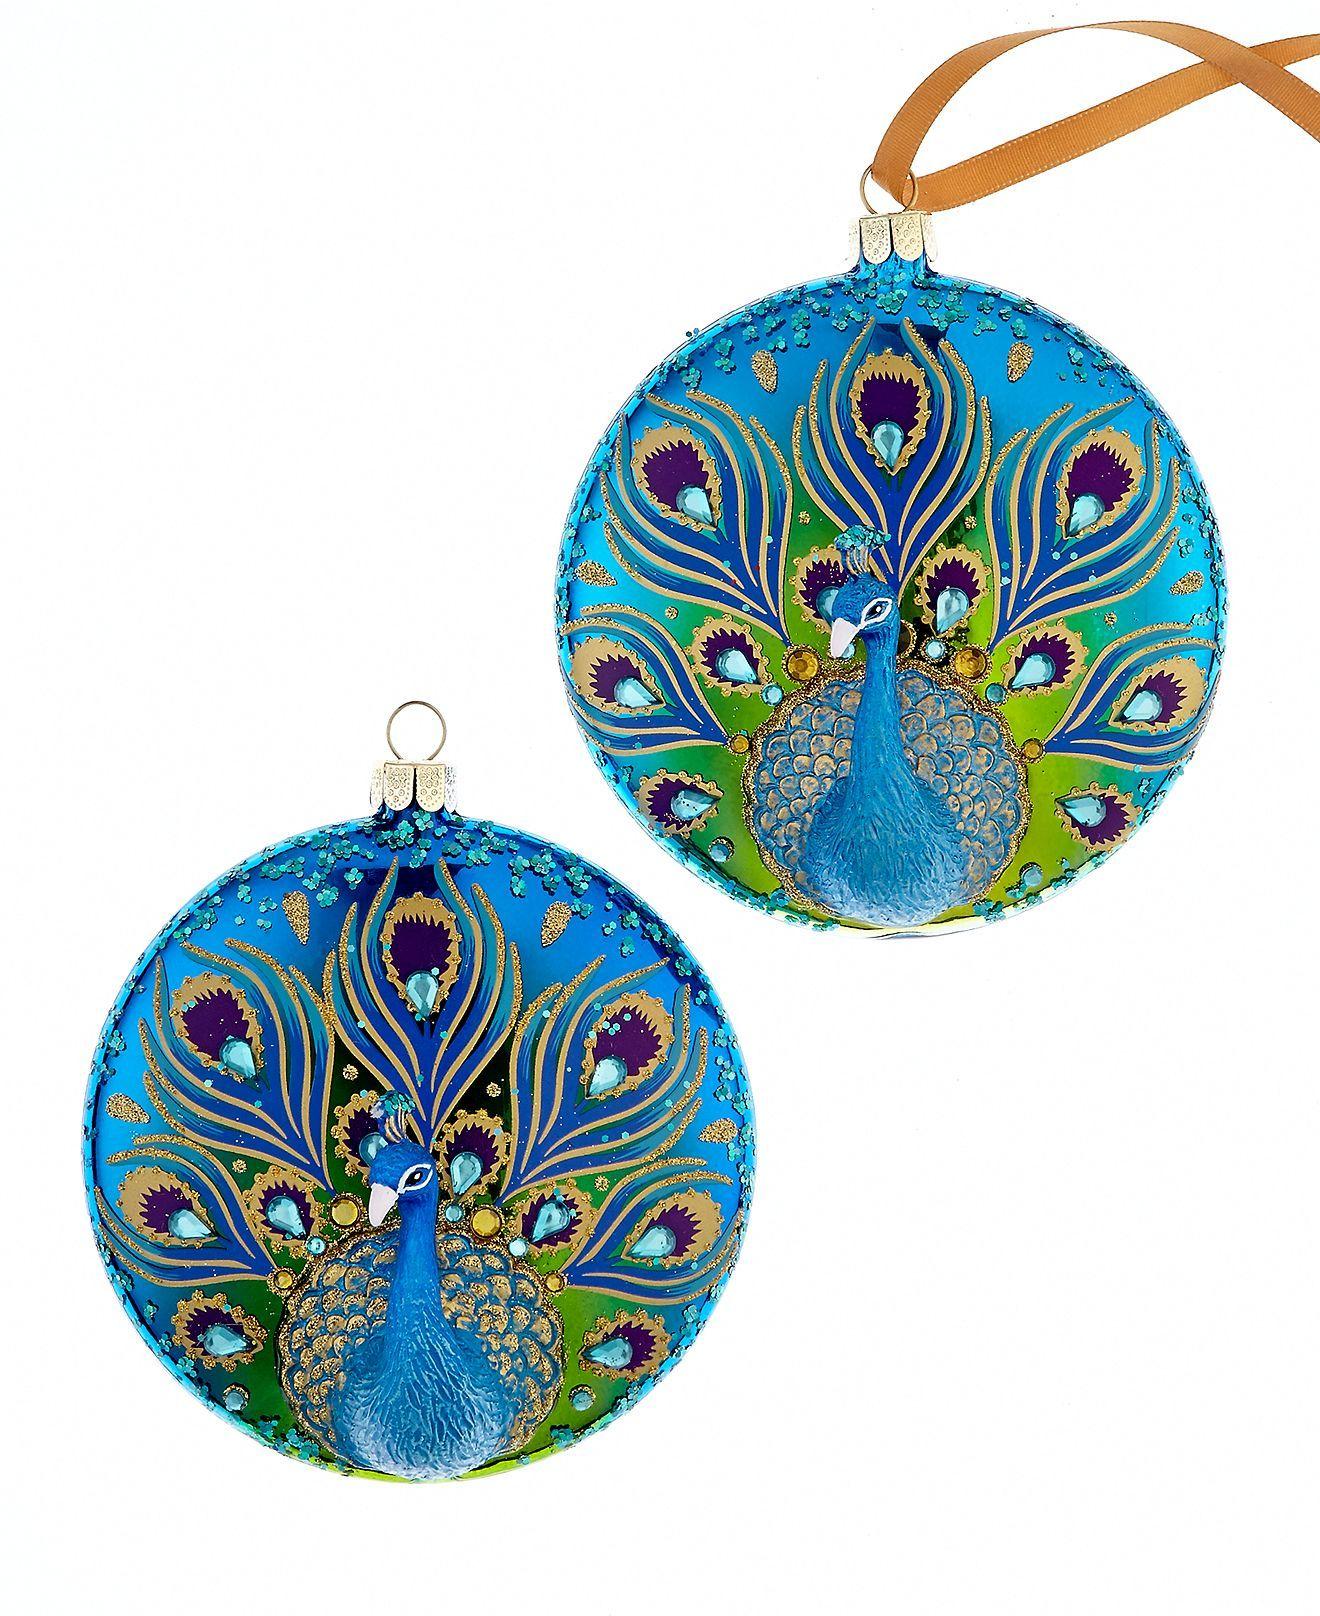 Holiday Lane Christmas Ornaments, Set Of 2 Peacock Disks  Christmas  Ornaments  Holiday Lane